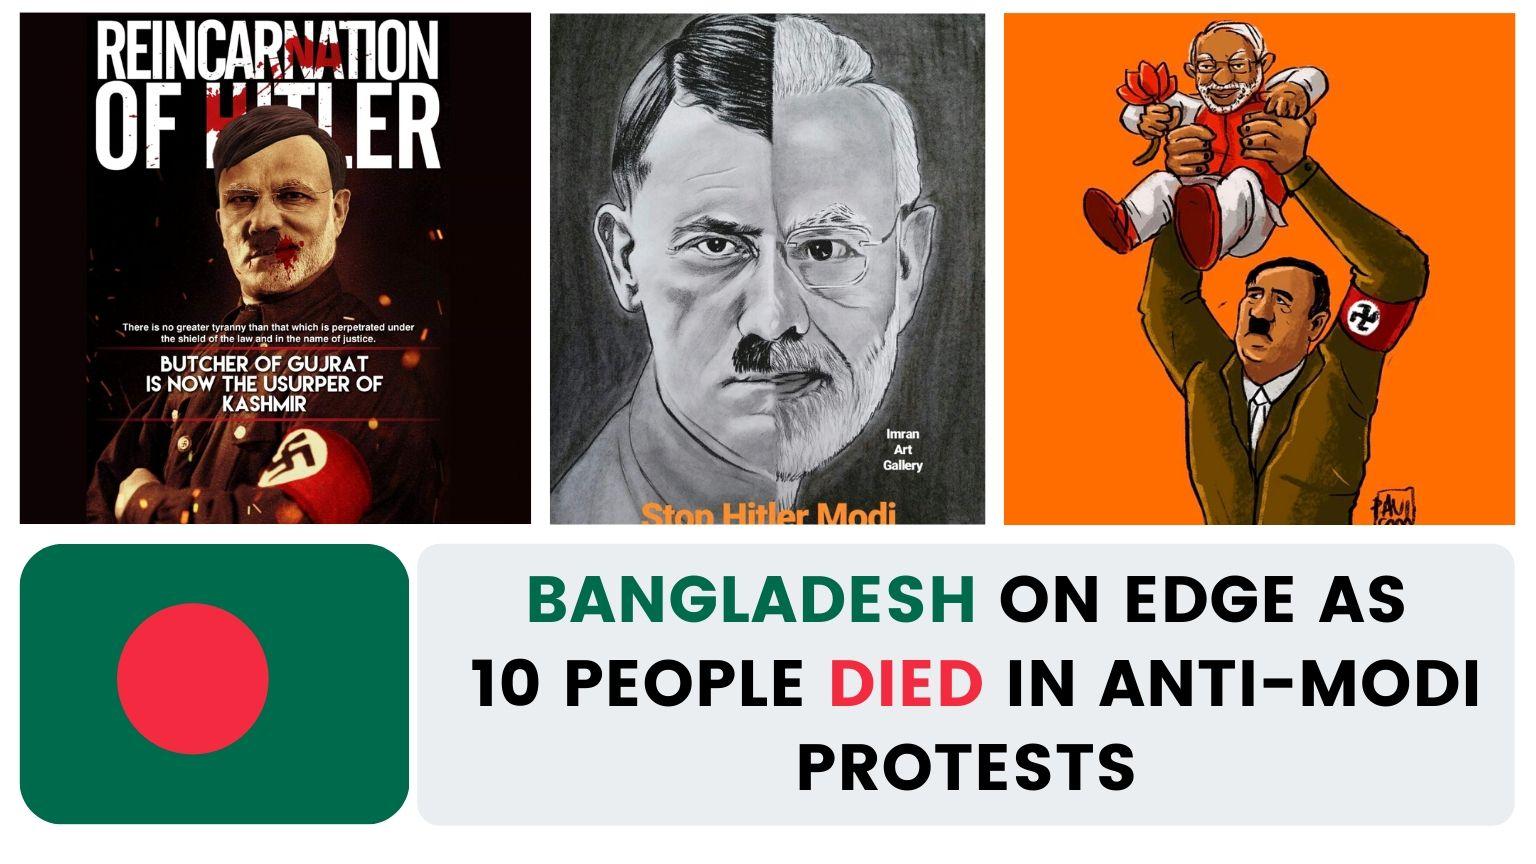 🇧🇩 Bangladesh on edge as 10 people died in anti-Modi protests | Modi visits Bangladesh